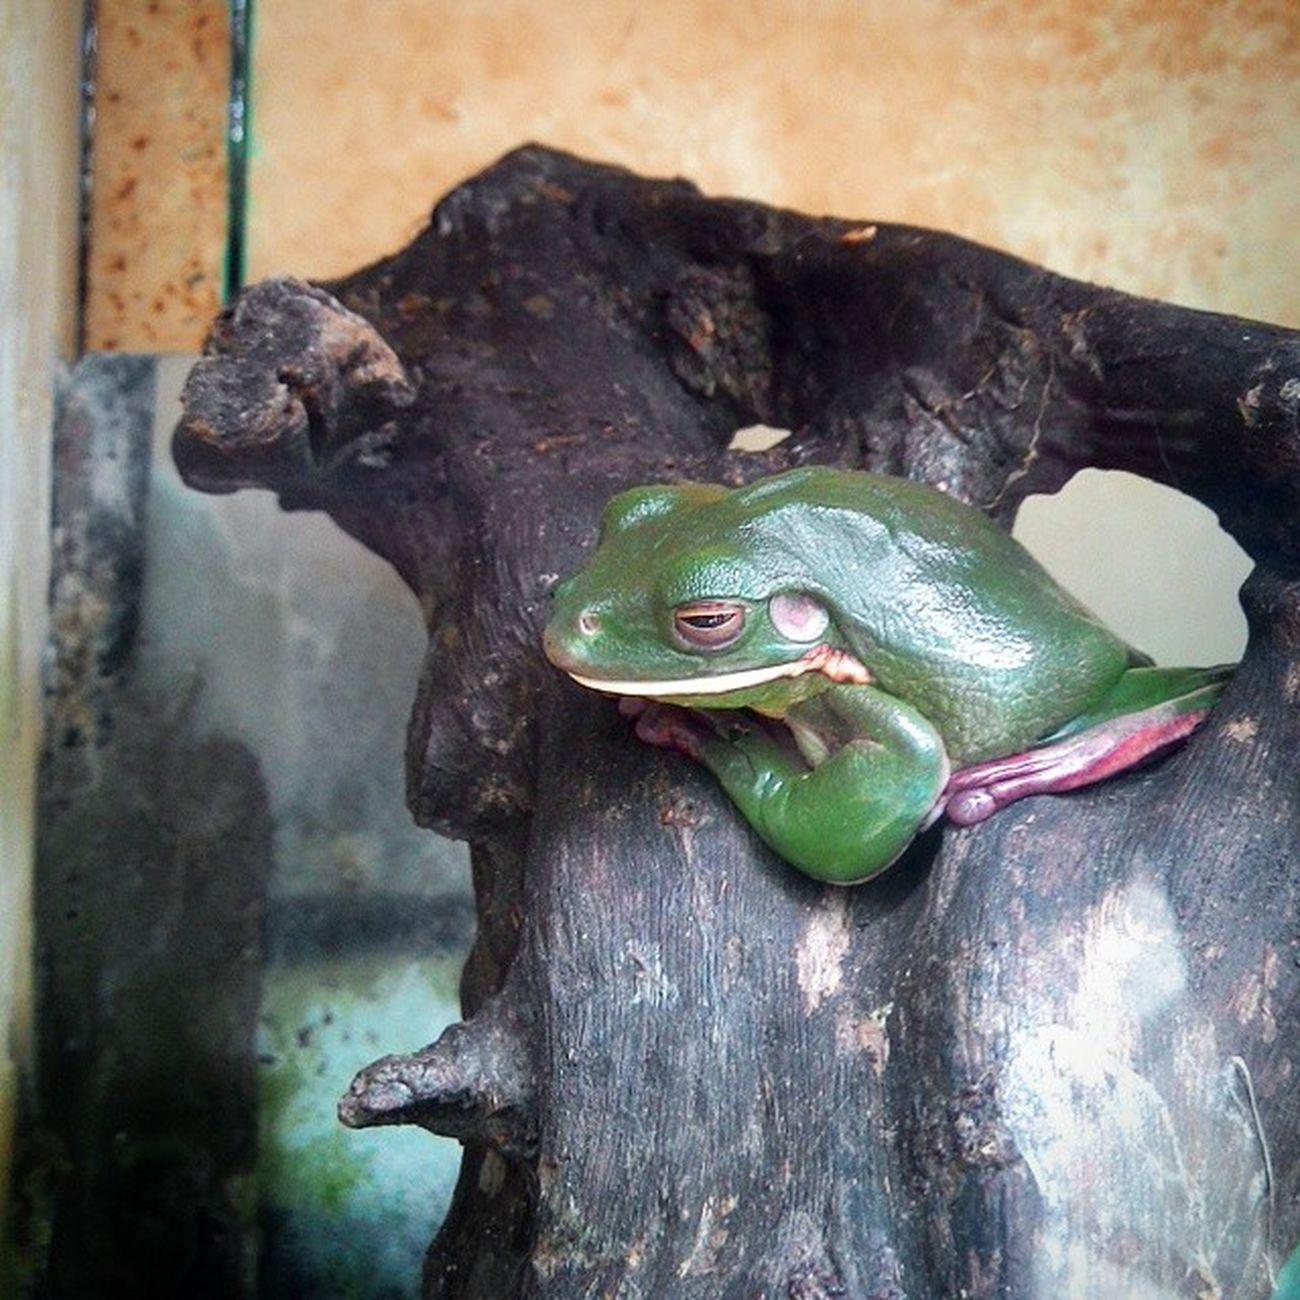 Green Frog Greenfrog Frog Animal World wild zoo binatang katak hijau kebunbinatang gembiralokazoo park